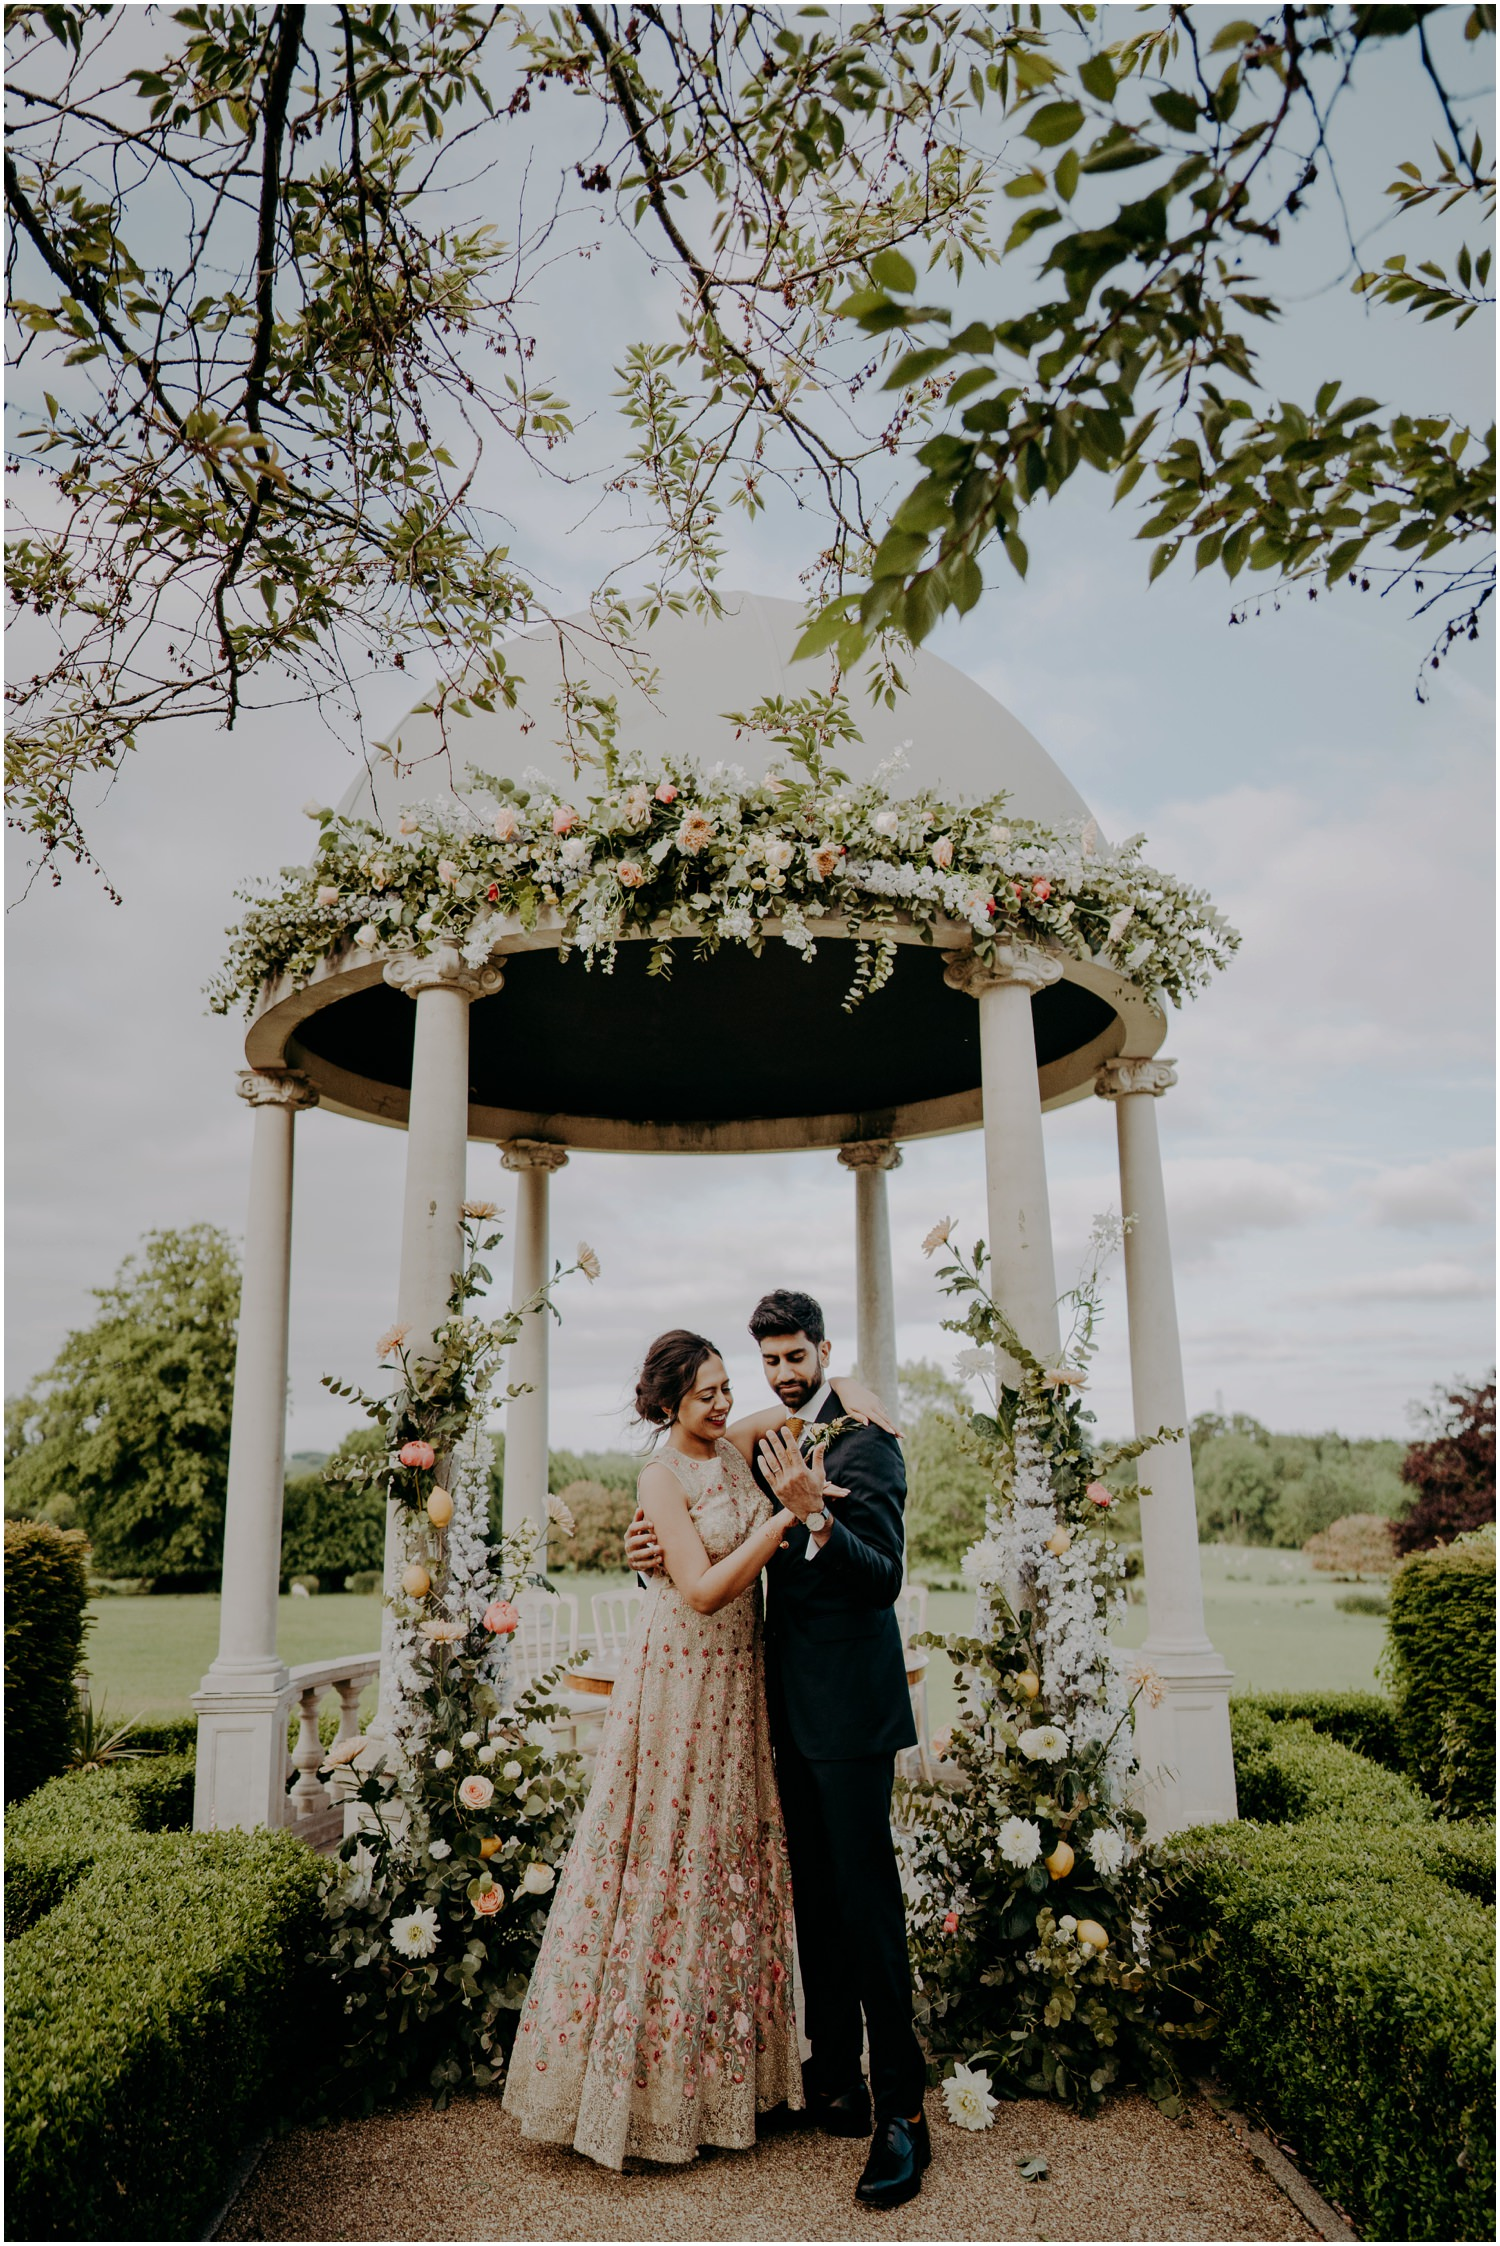 brighton alternative wedding photographer49.jpg